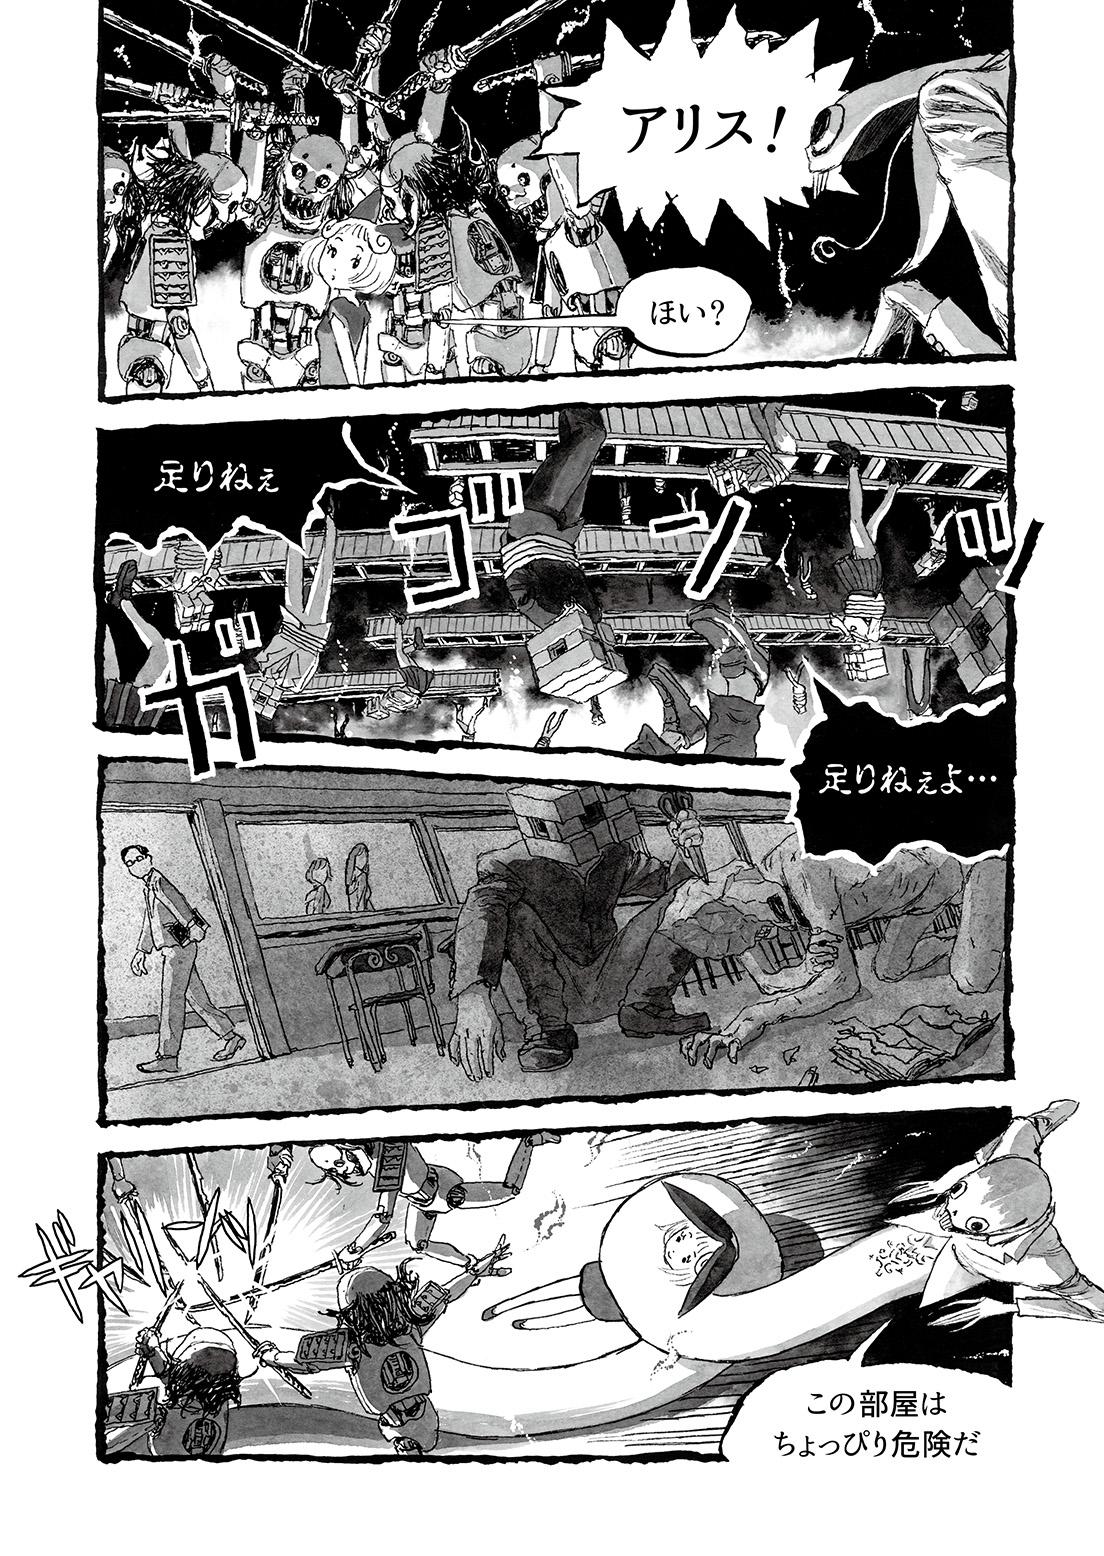 長編漫画「BIBLIOMANIA」連載 第2話「430号室の審判」16P